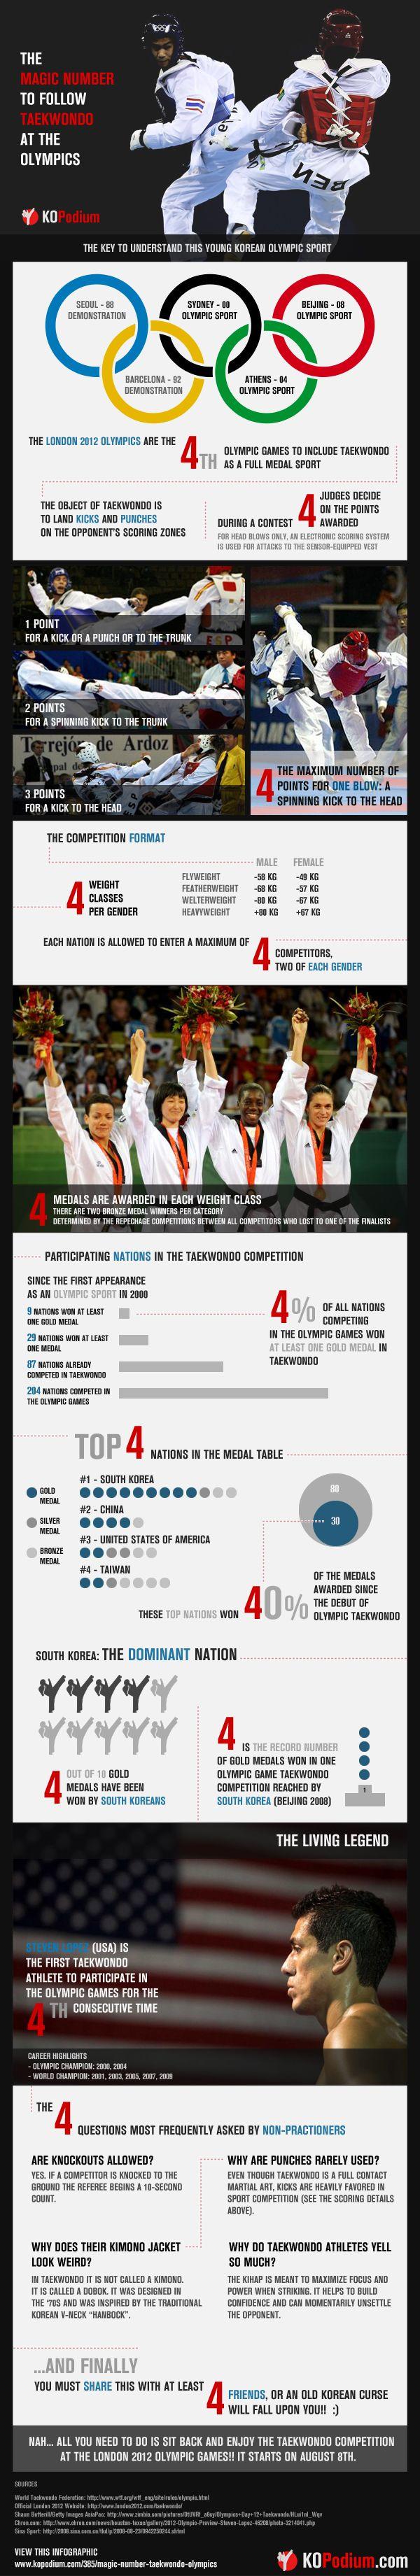 The Magic Number To Follow Taekwondo At The Olympics